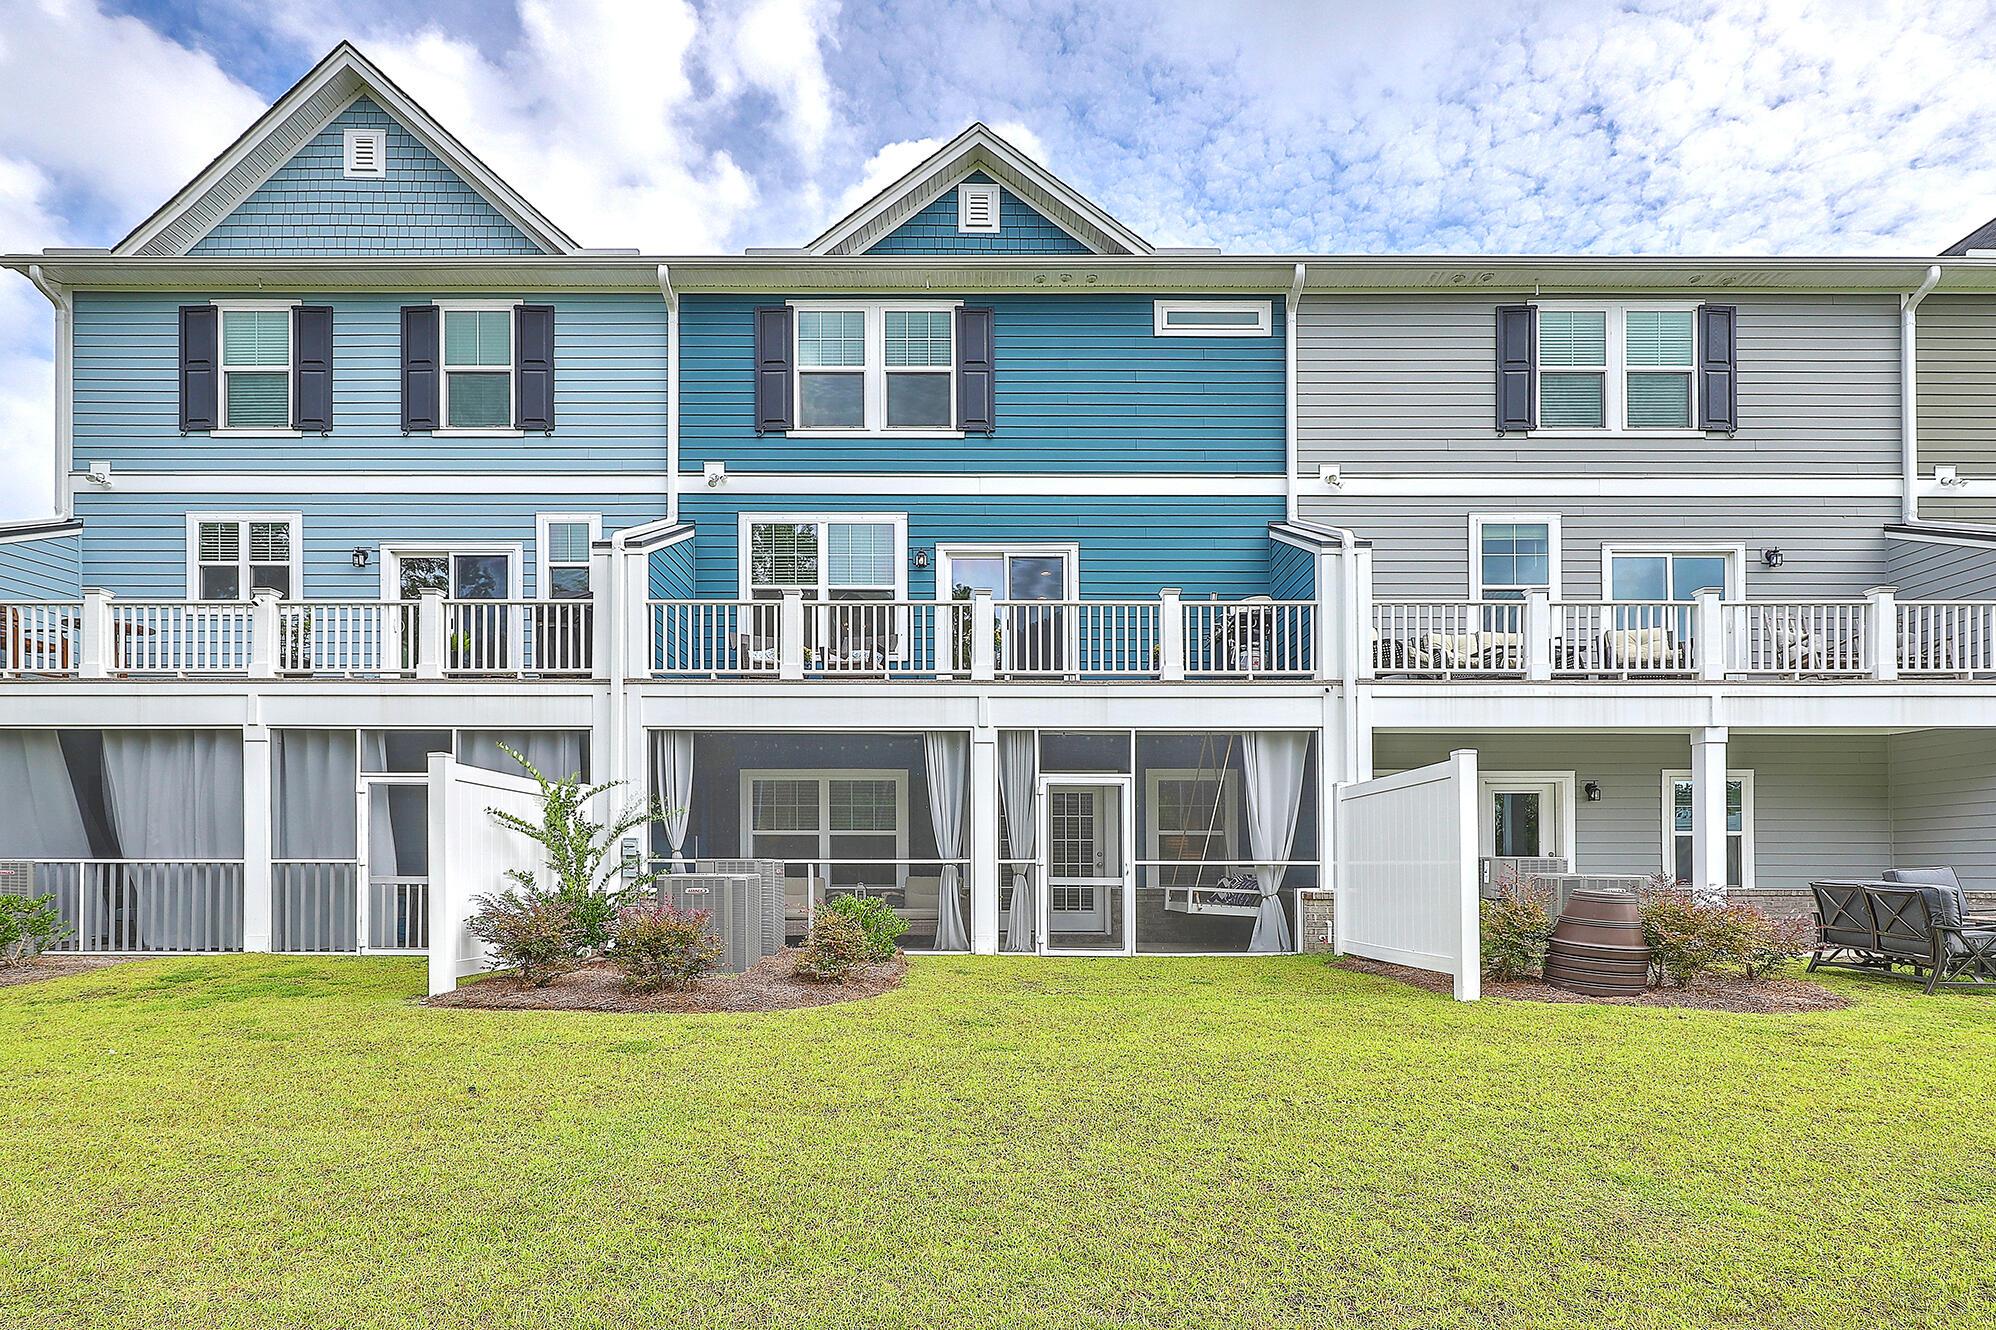 Park West Homes For Sale - 1548 Moss Spring, Mount Pleasant, SC - 11